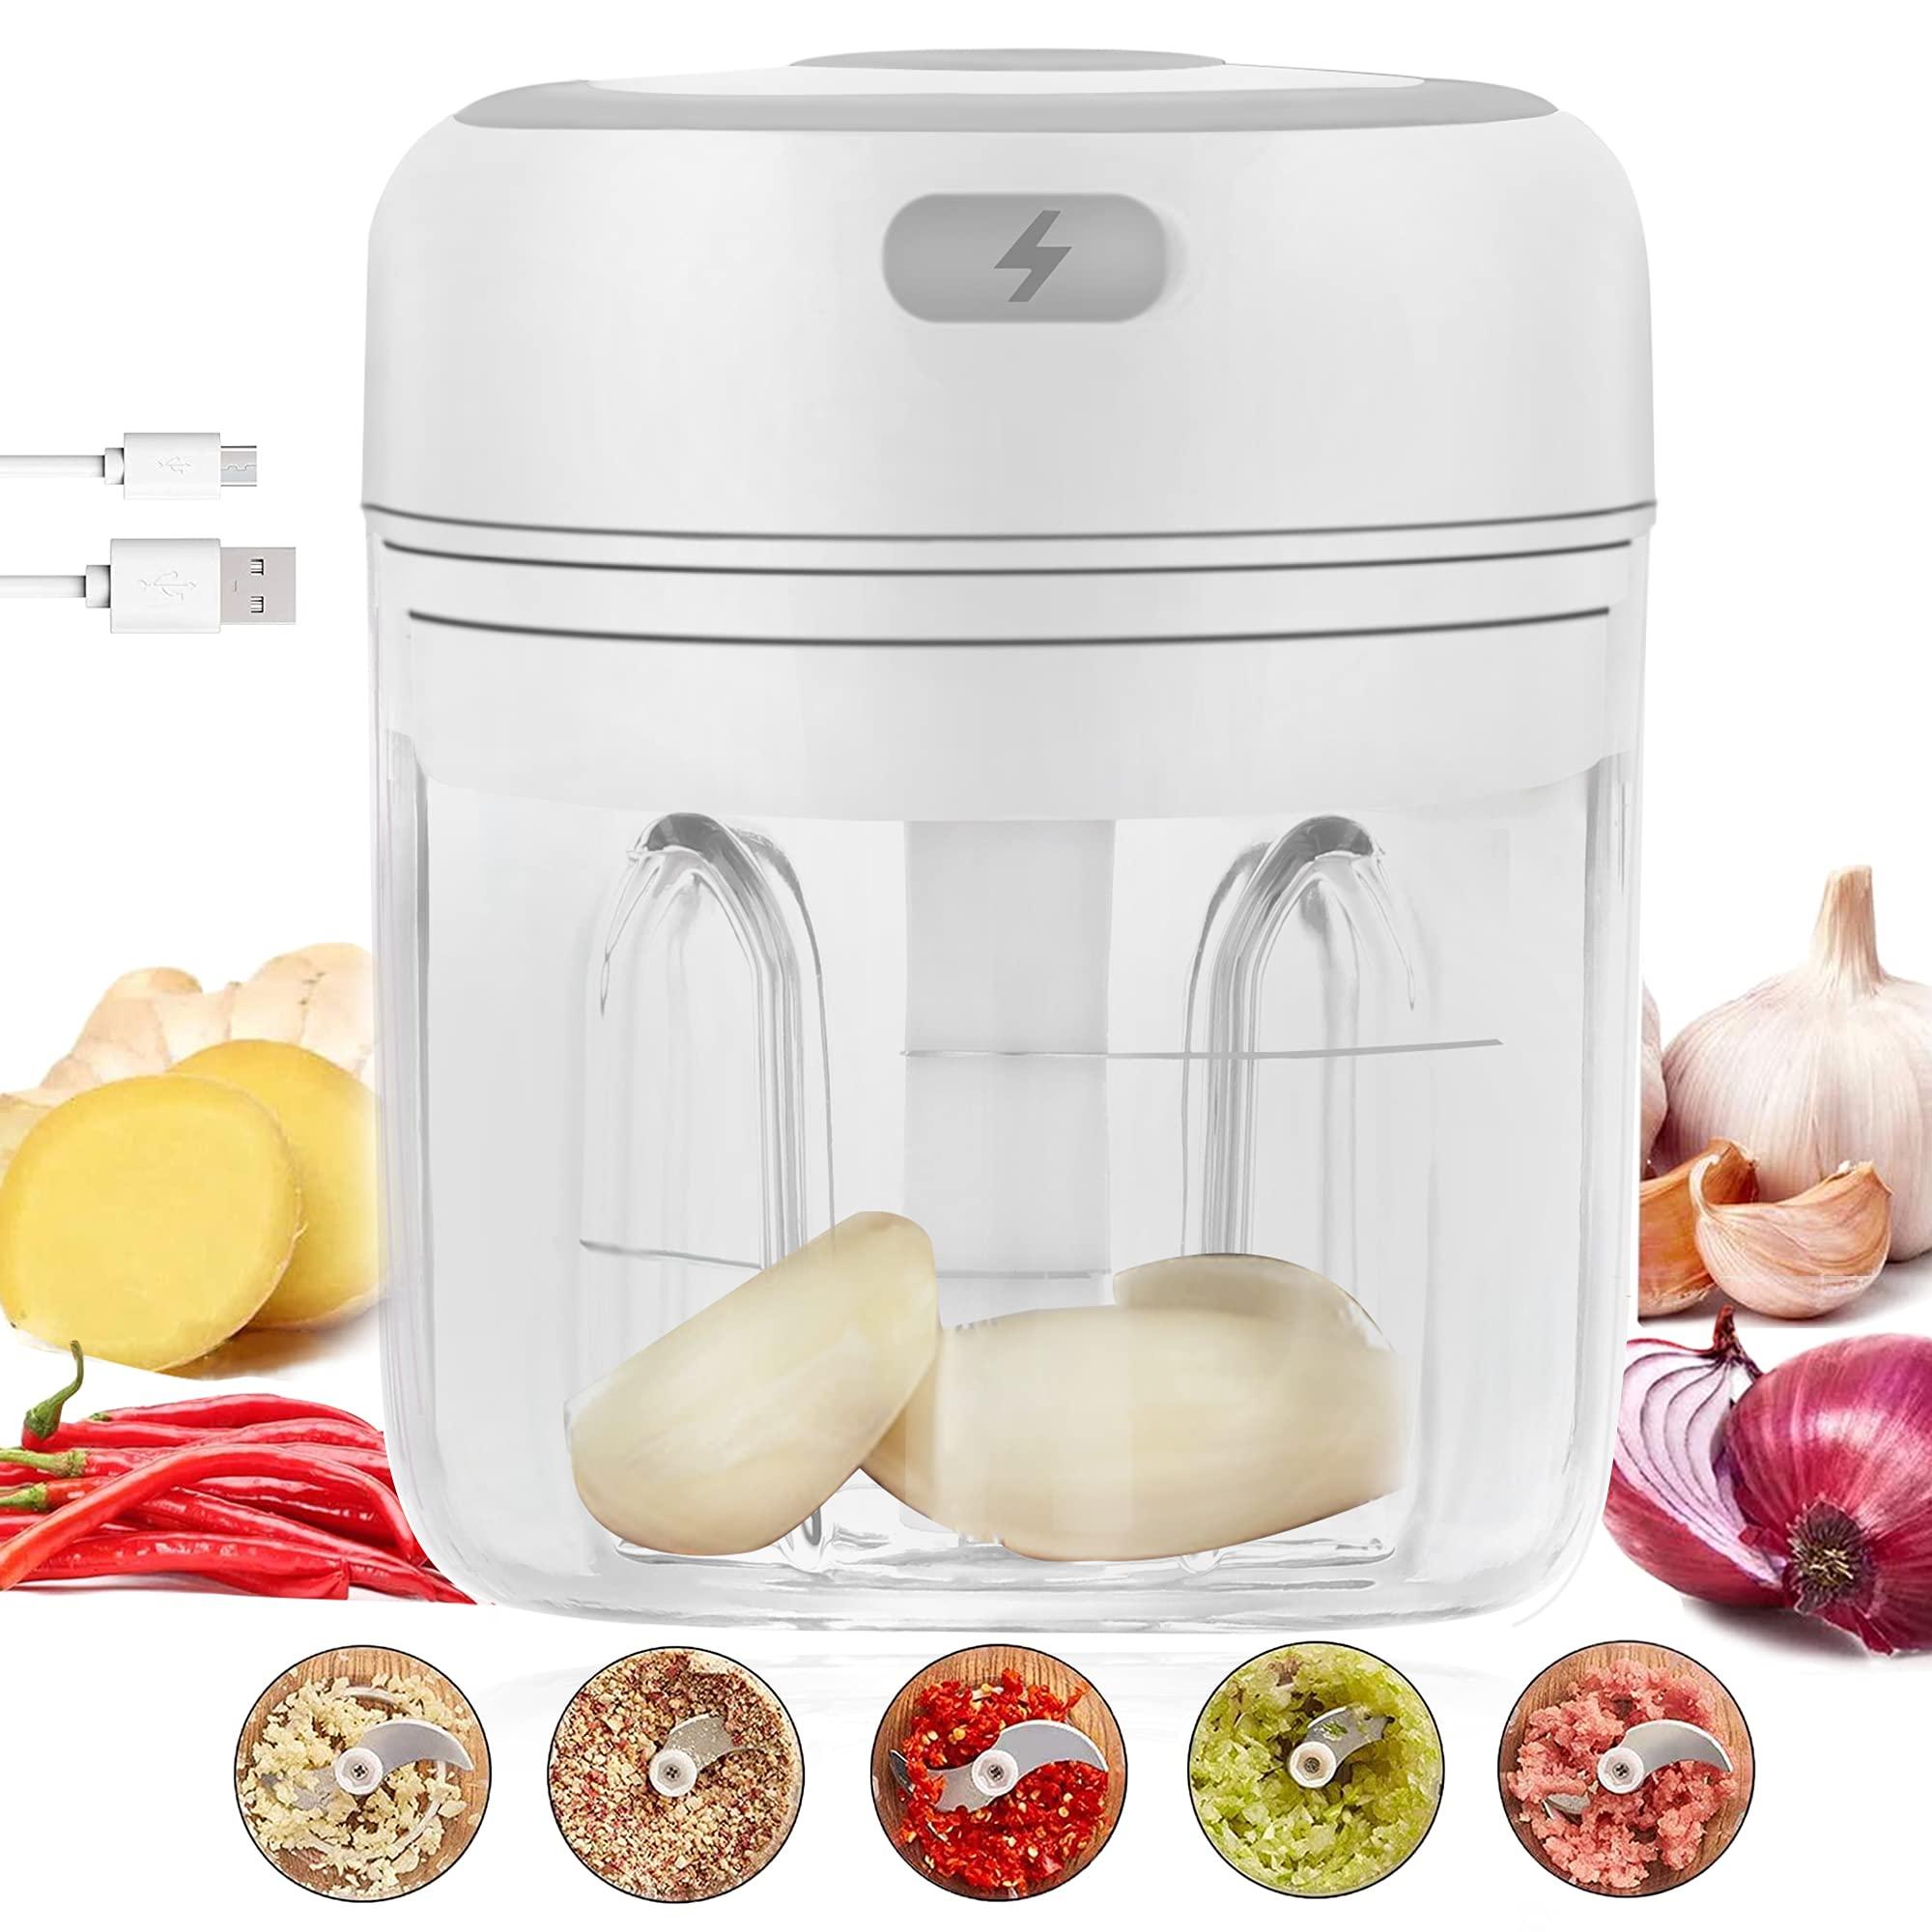 Electric Garlic Chopper Mini Cutter Garlic Masher Powerful Press Portable Food Processor